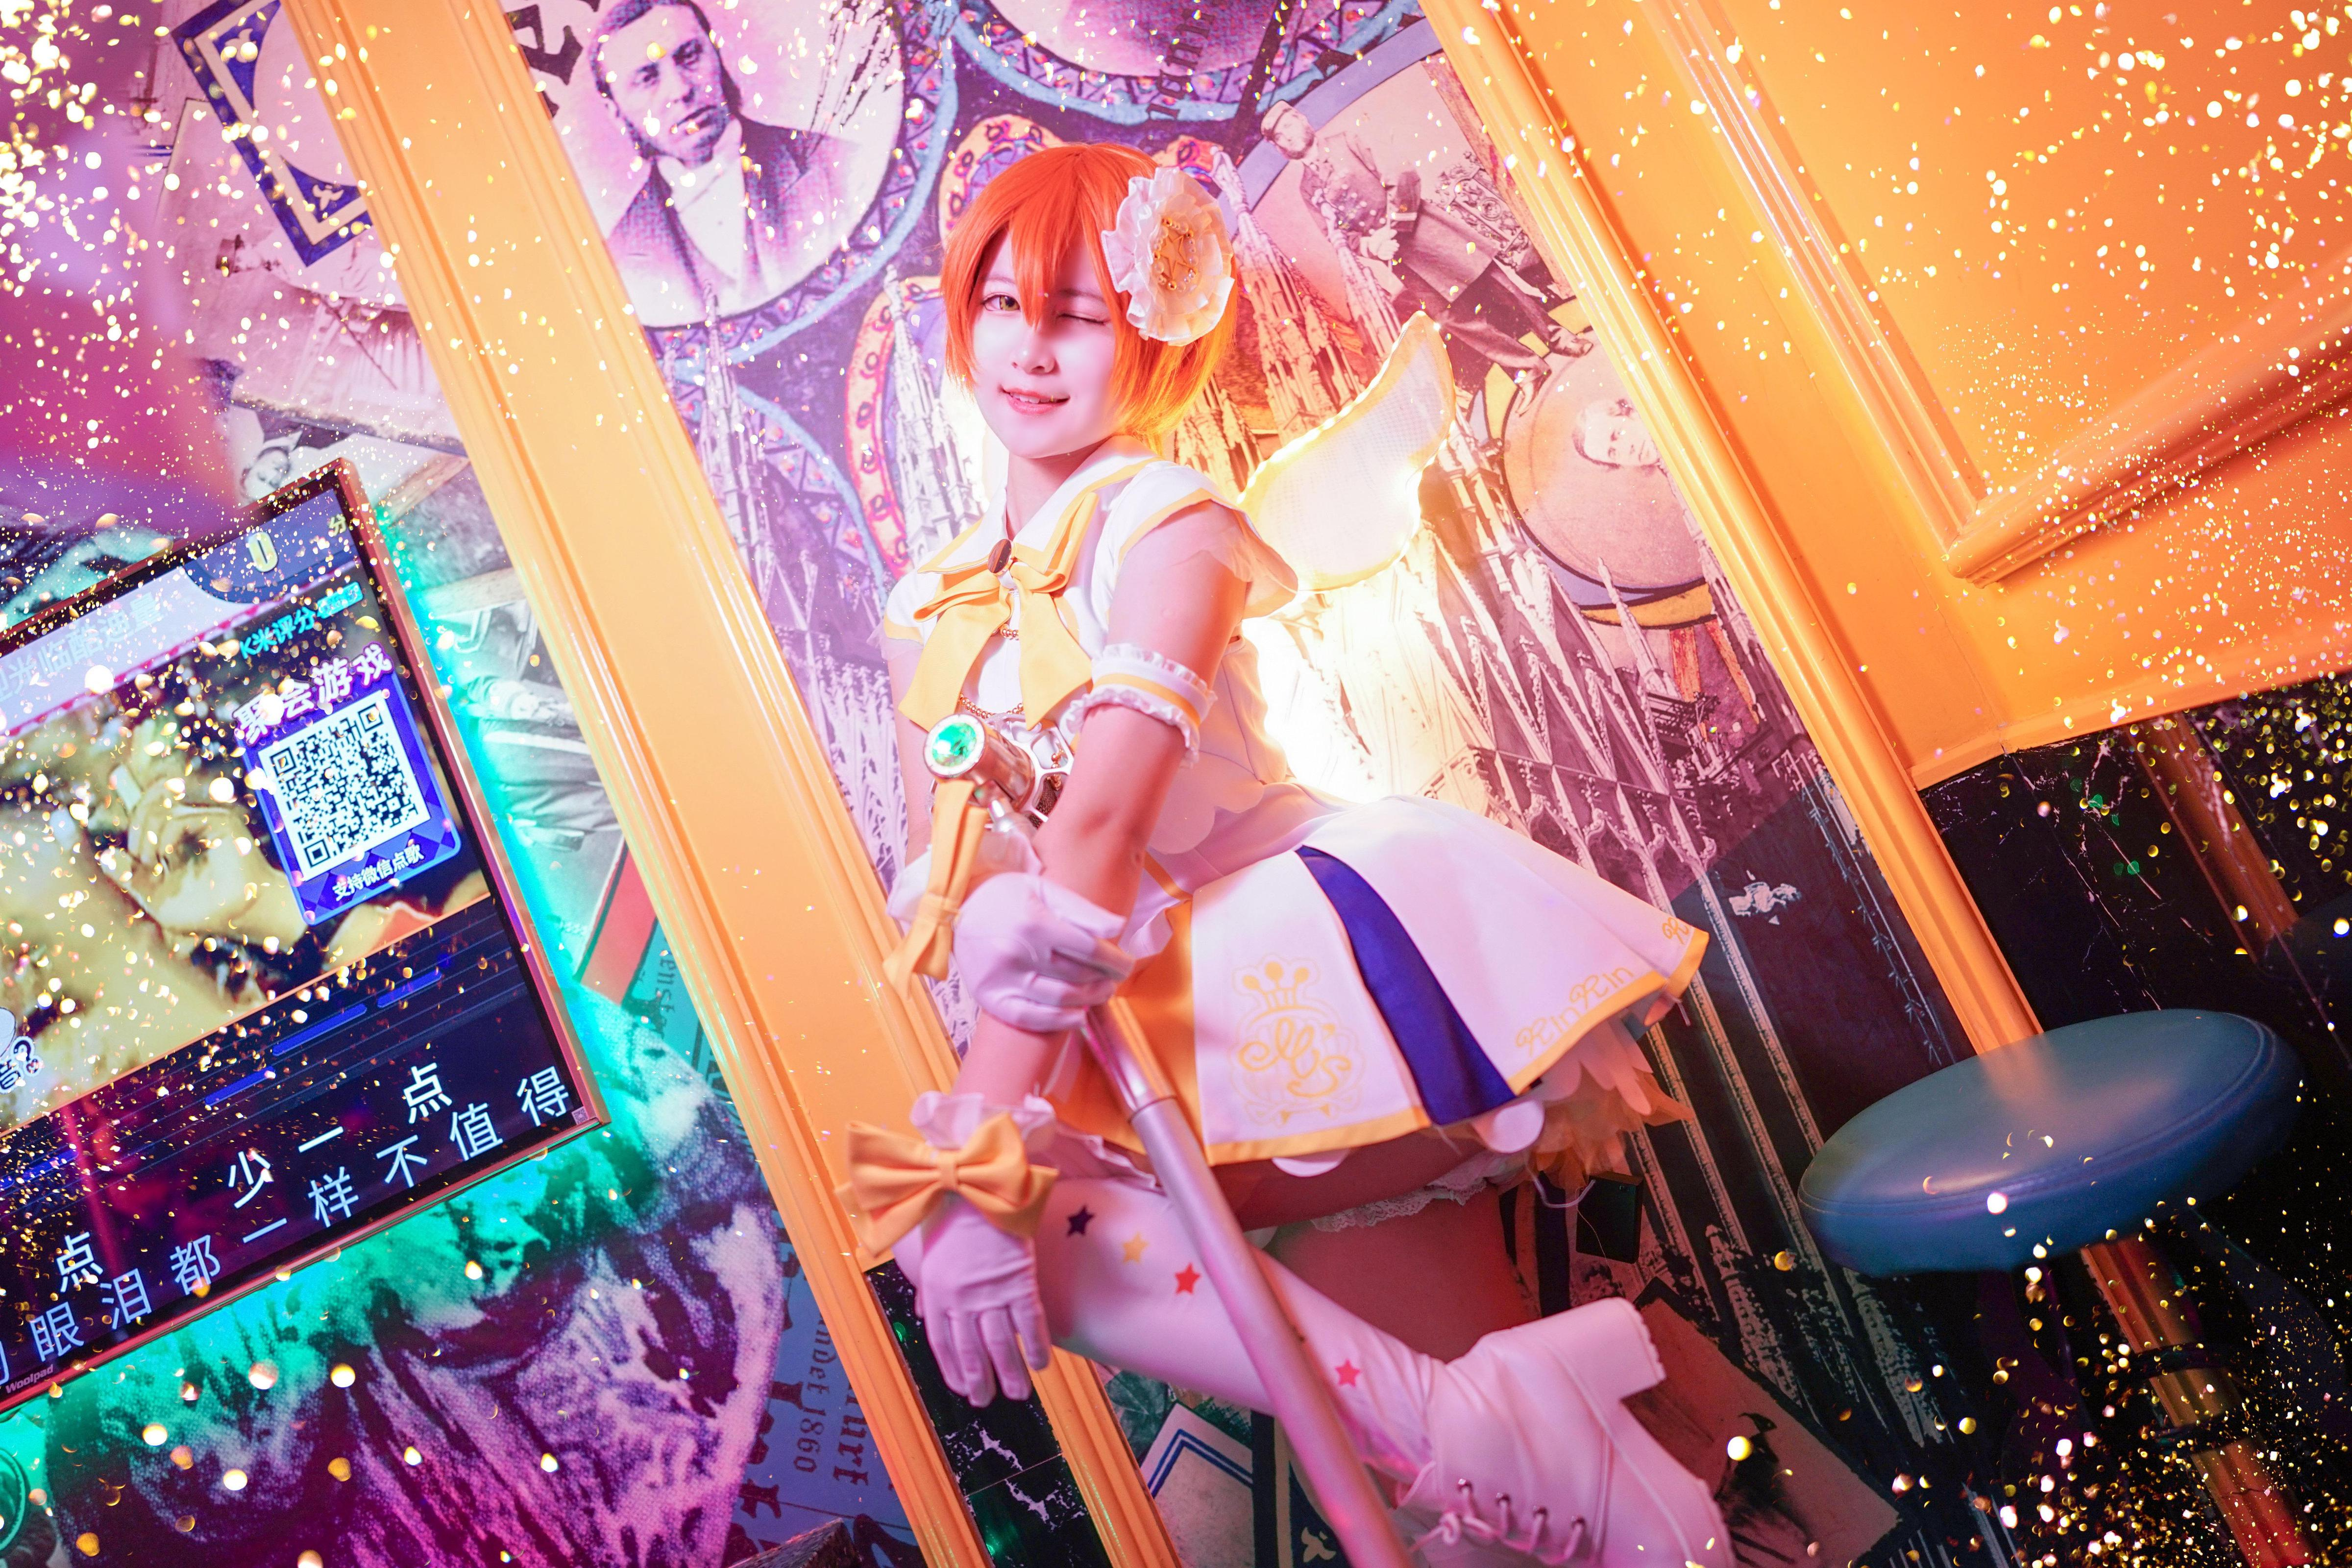 《LOVE LIVE!》少女cosplay【CN:_李笑颜Lee】-第7张